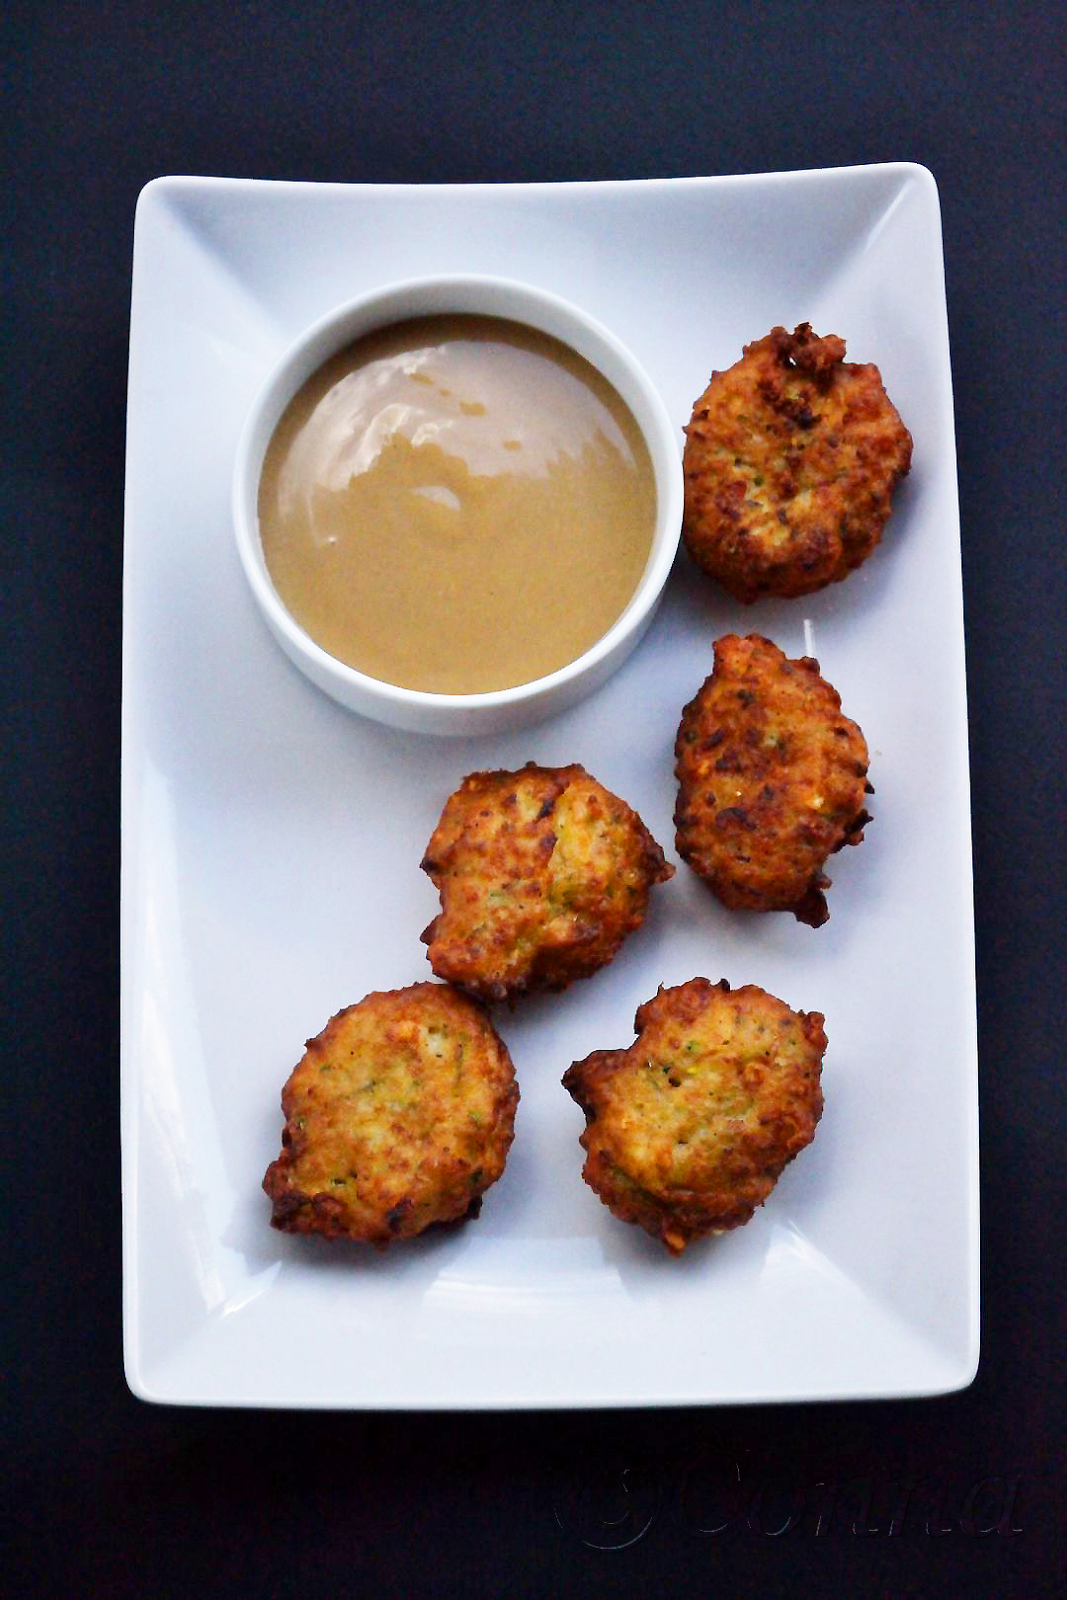 Sabor: Κολοκυθοκεφτέδες & ντιπ ταχινιού / Zucchini fritters & tahini dip